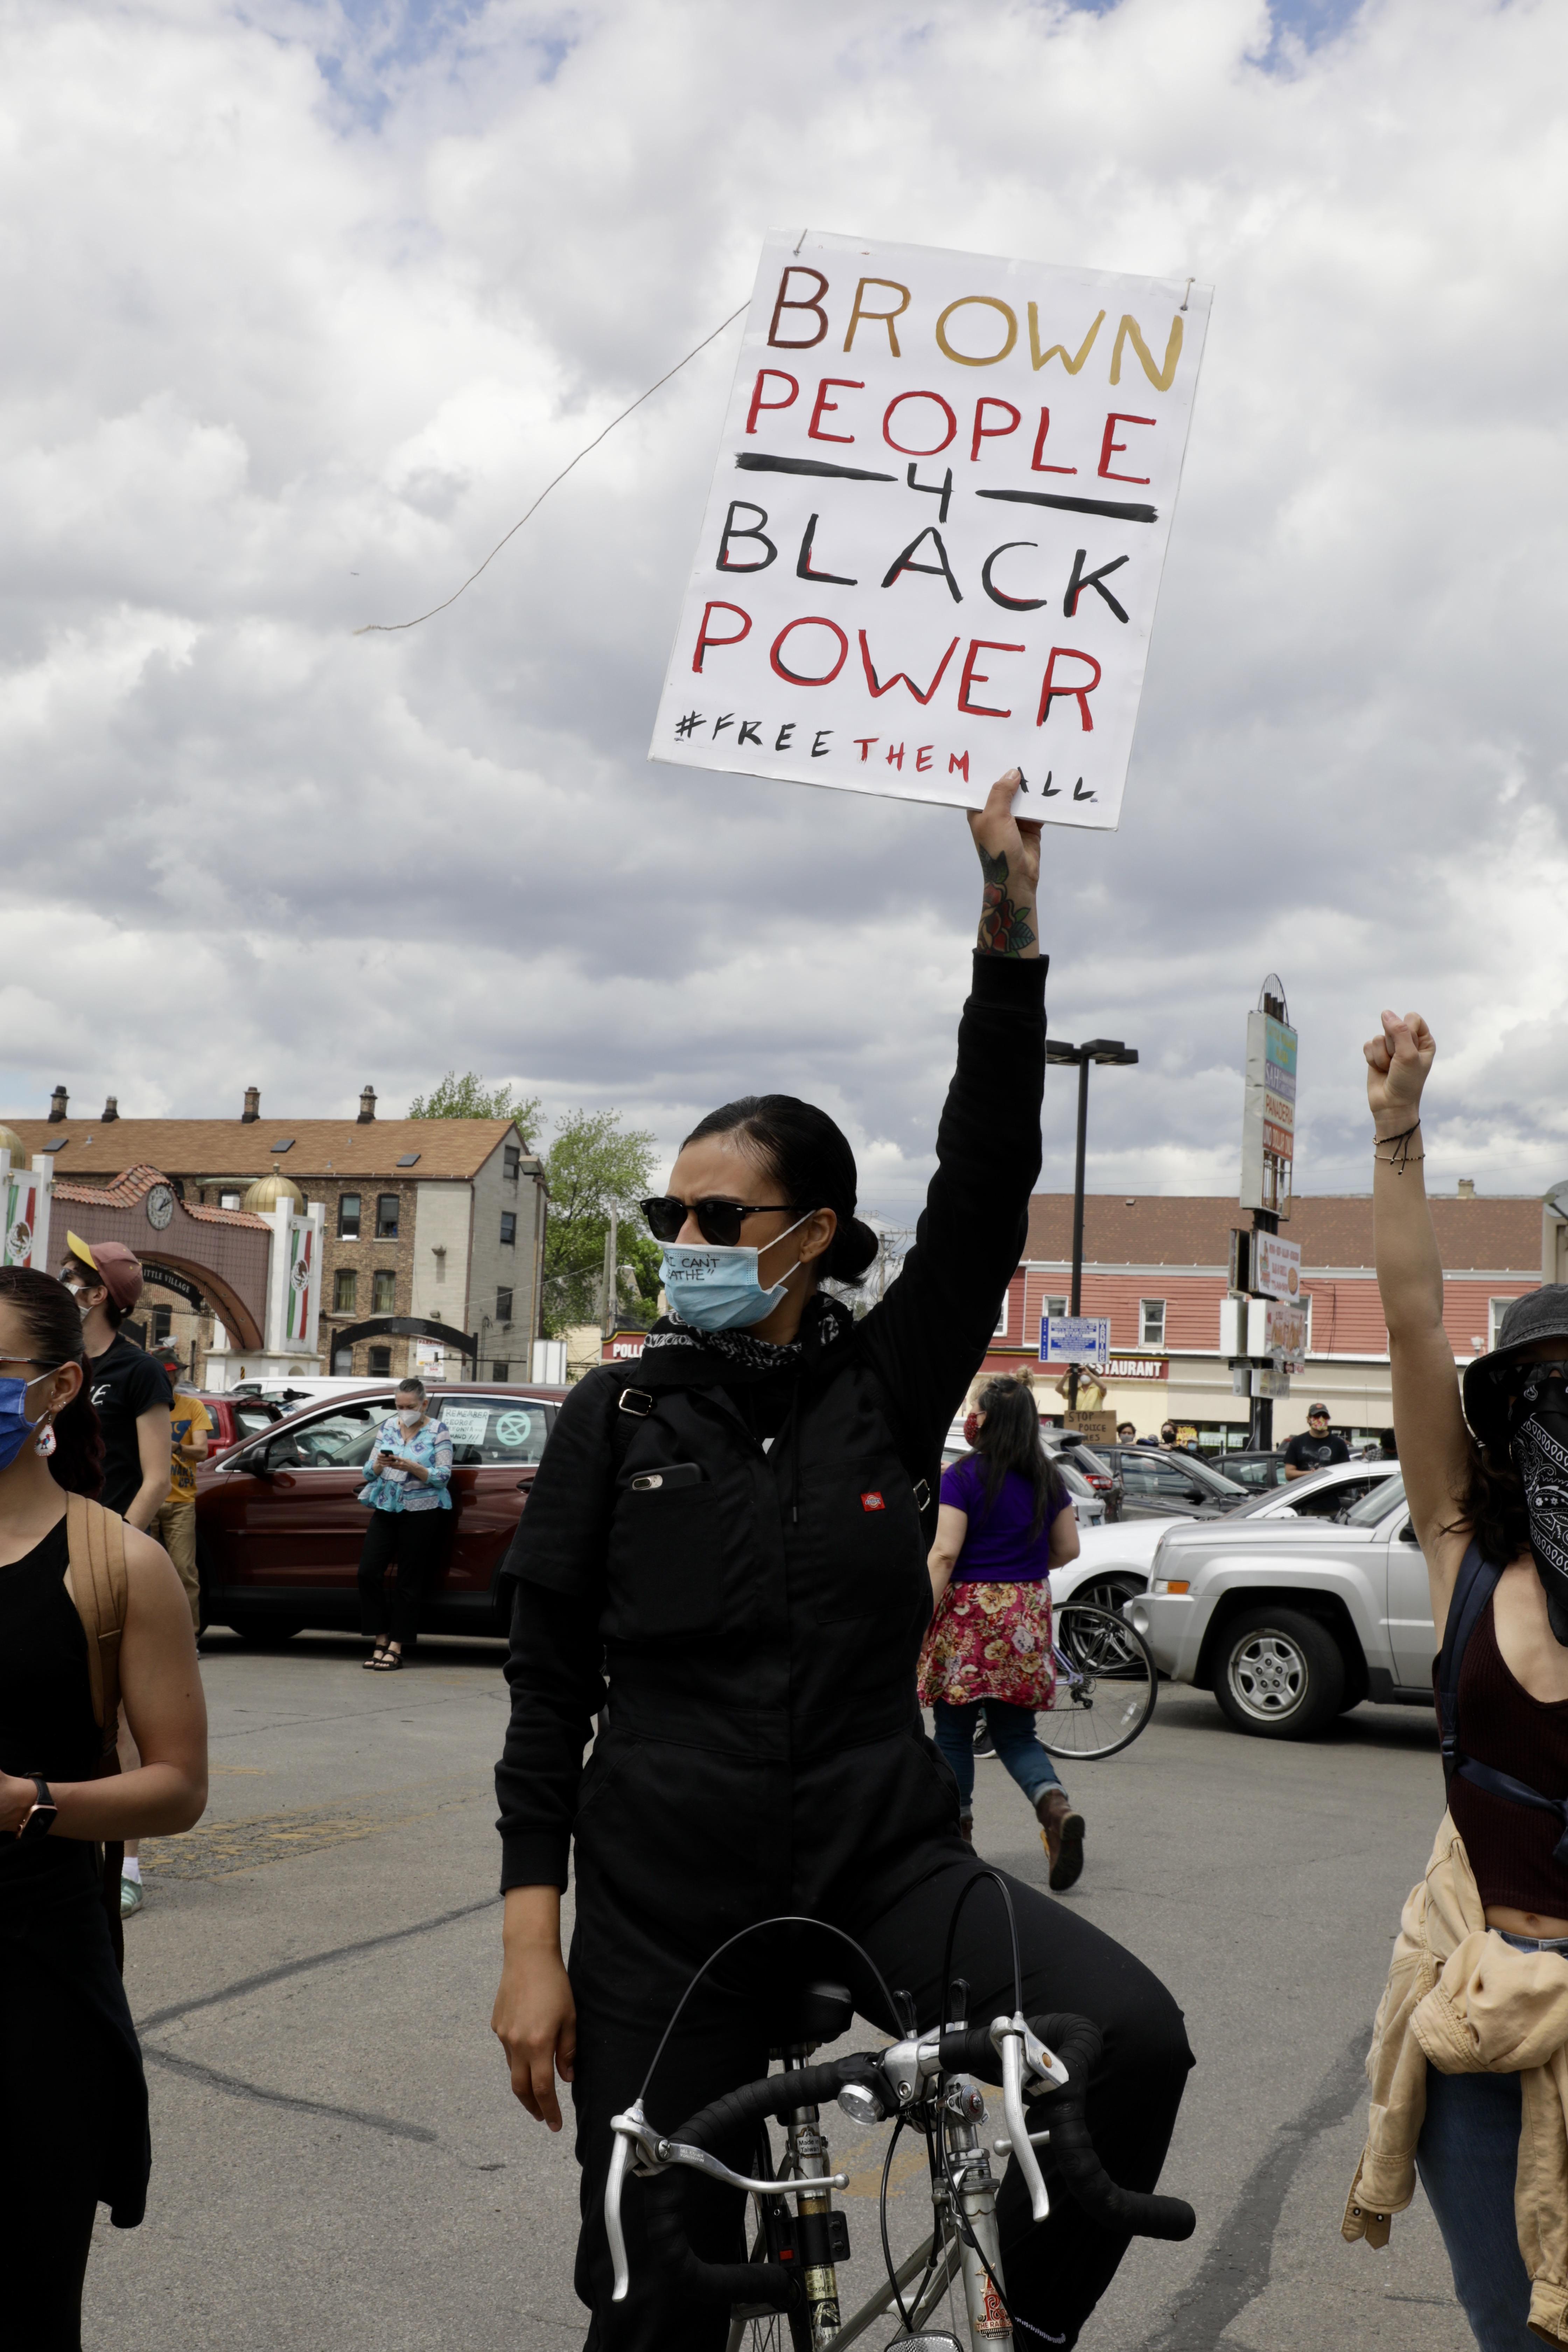 Brown black power poster